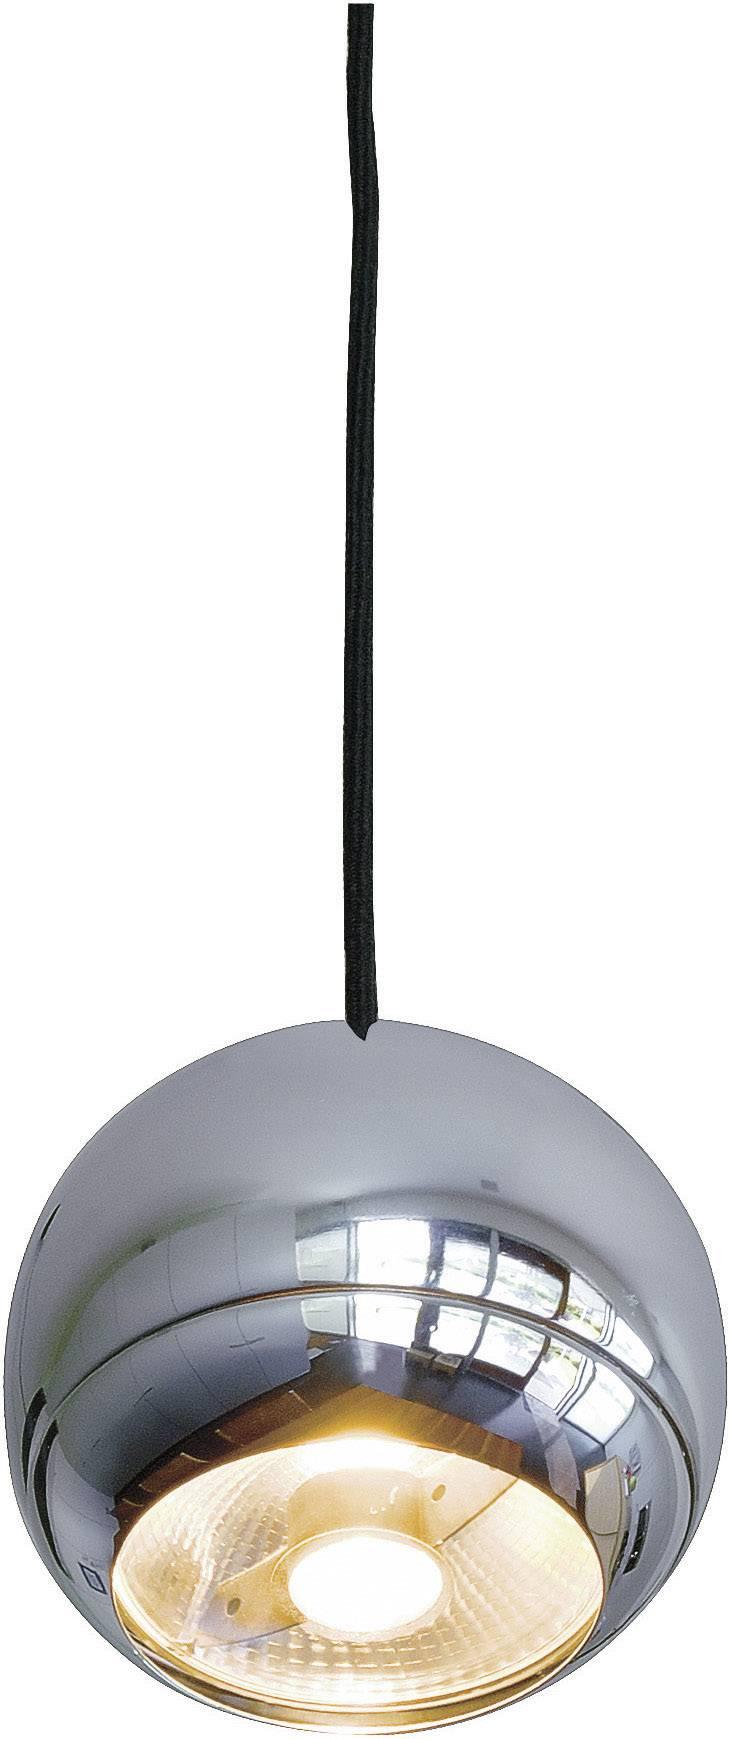 SLV Light Eye 133482 Pendelleuchte Energiesparlampe GU10 EEK: abhängig v. Leuchtmittel (A++ E) 75 W Chrom